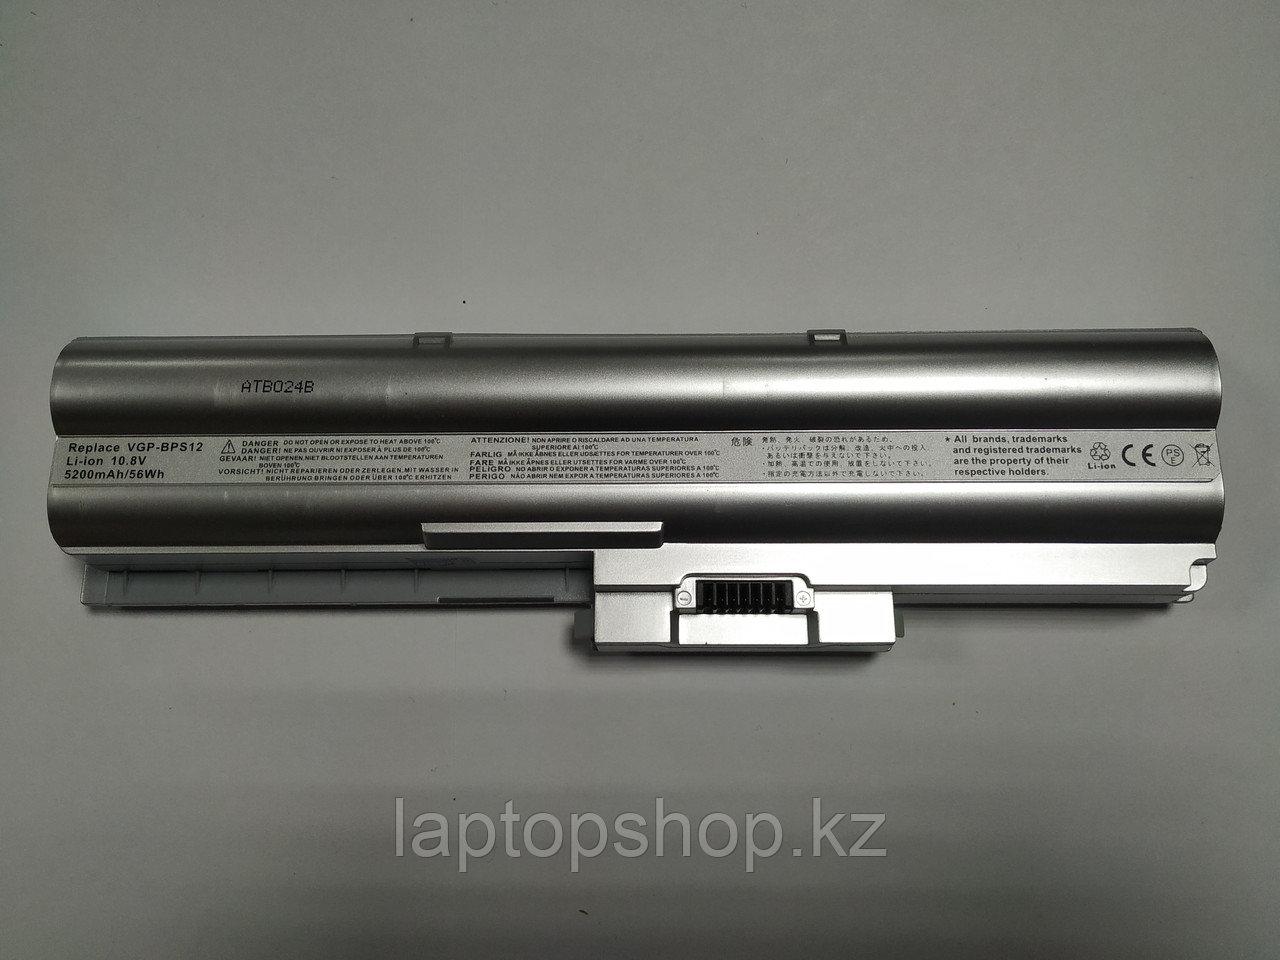 Батарея для ноутбука Совместимая for Sony Vaio VGP-BPS12